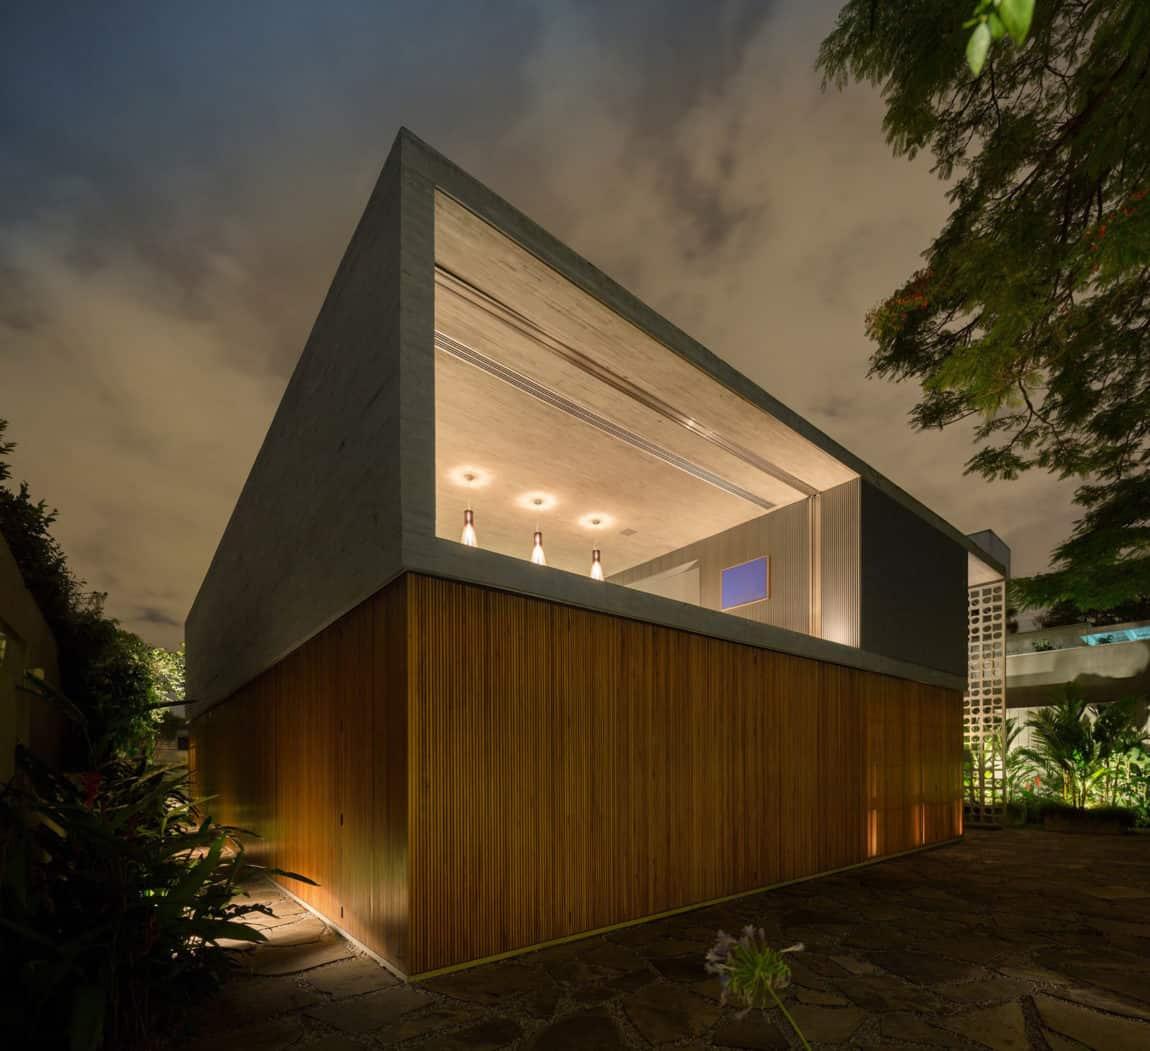 B+B House by studio mk27 & Galeria Arquitetos (31)